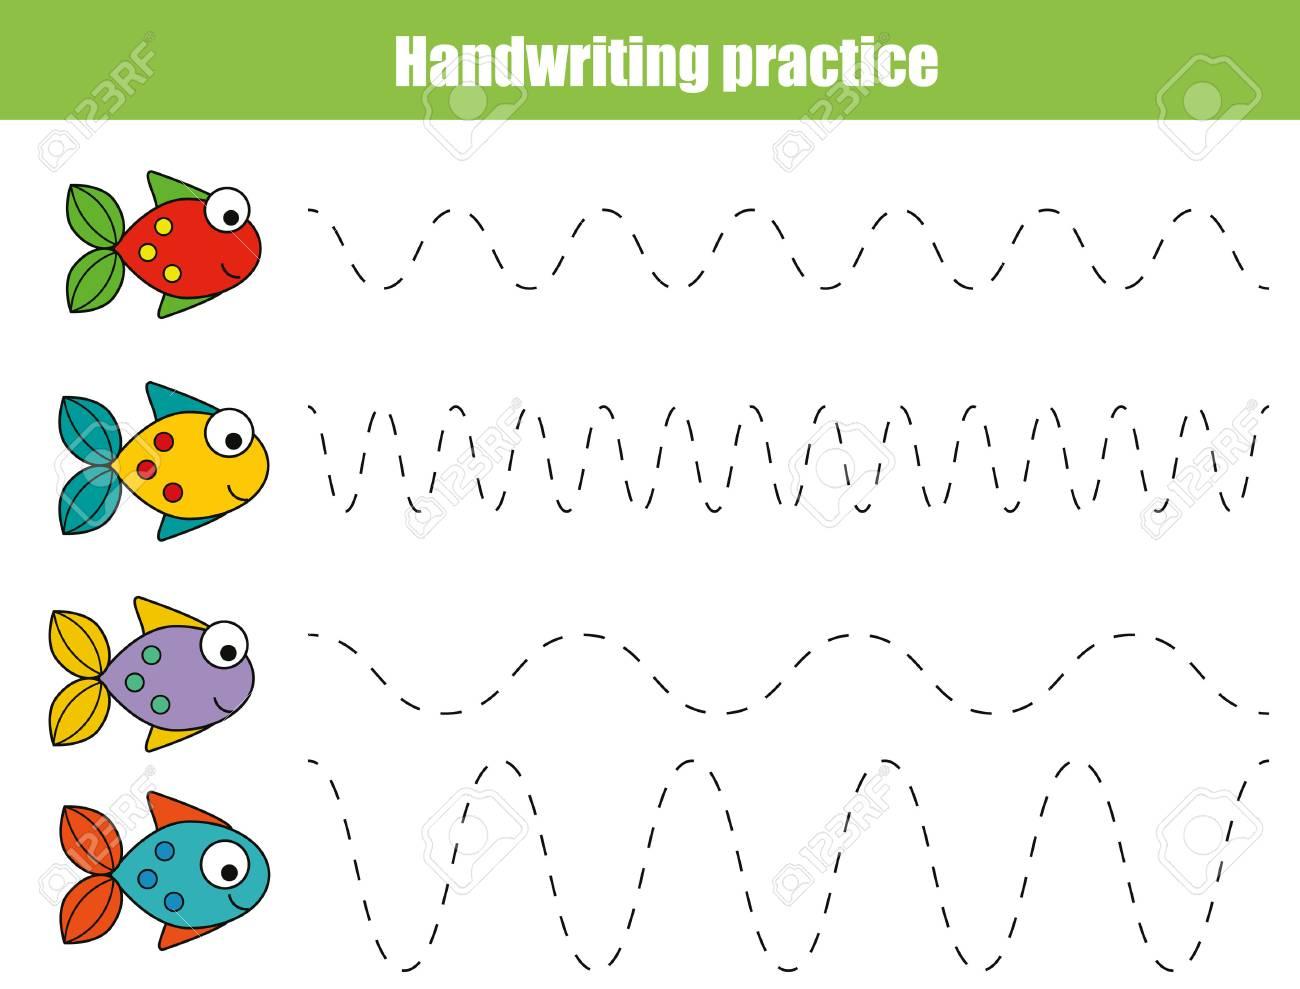 handwriting practice sheet. educational children game, restore